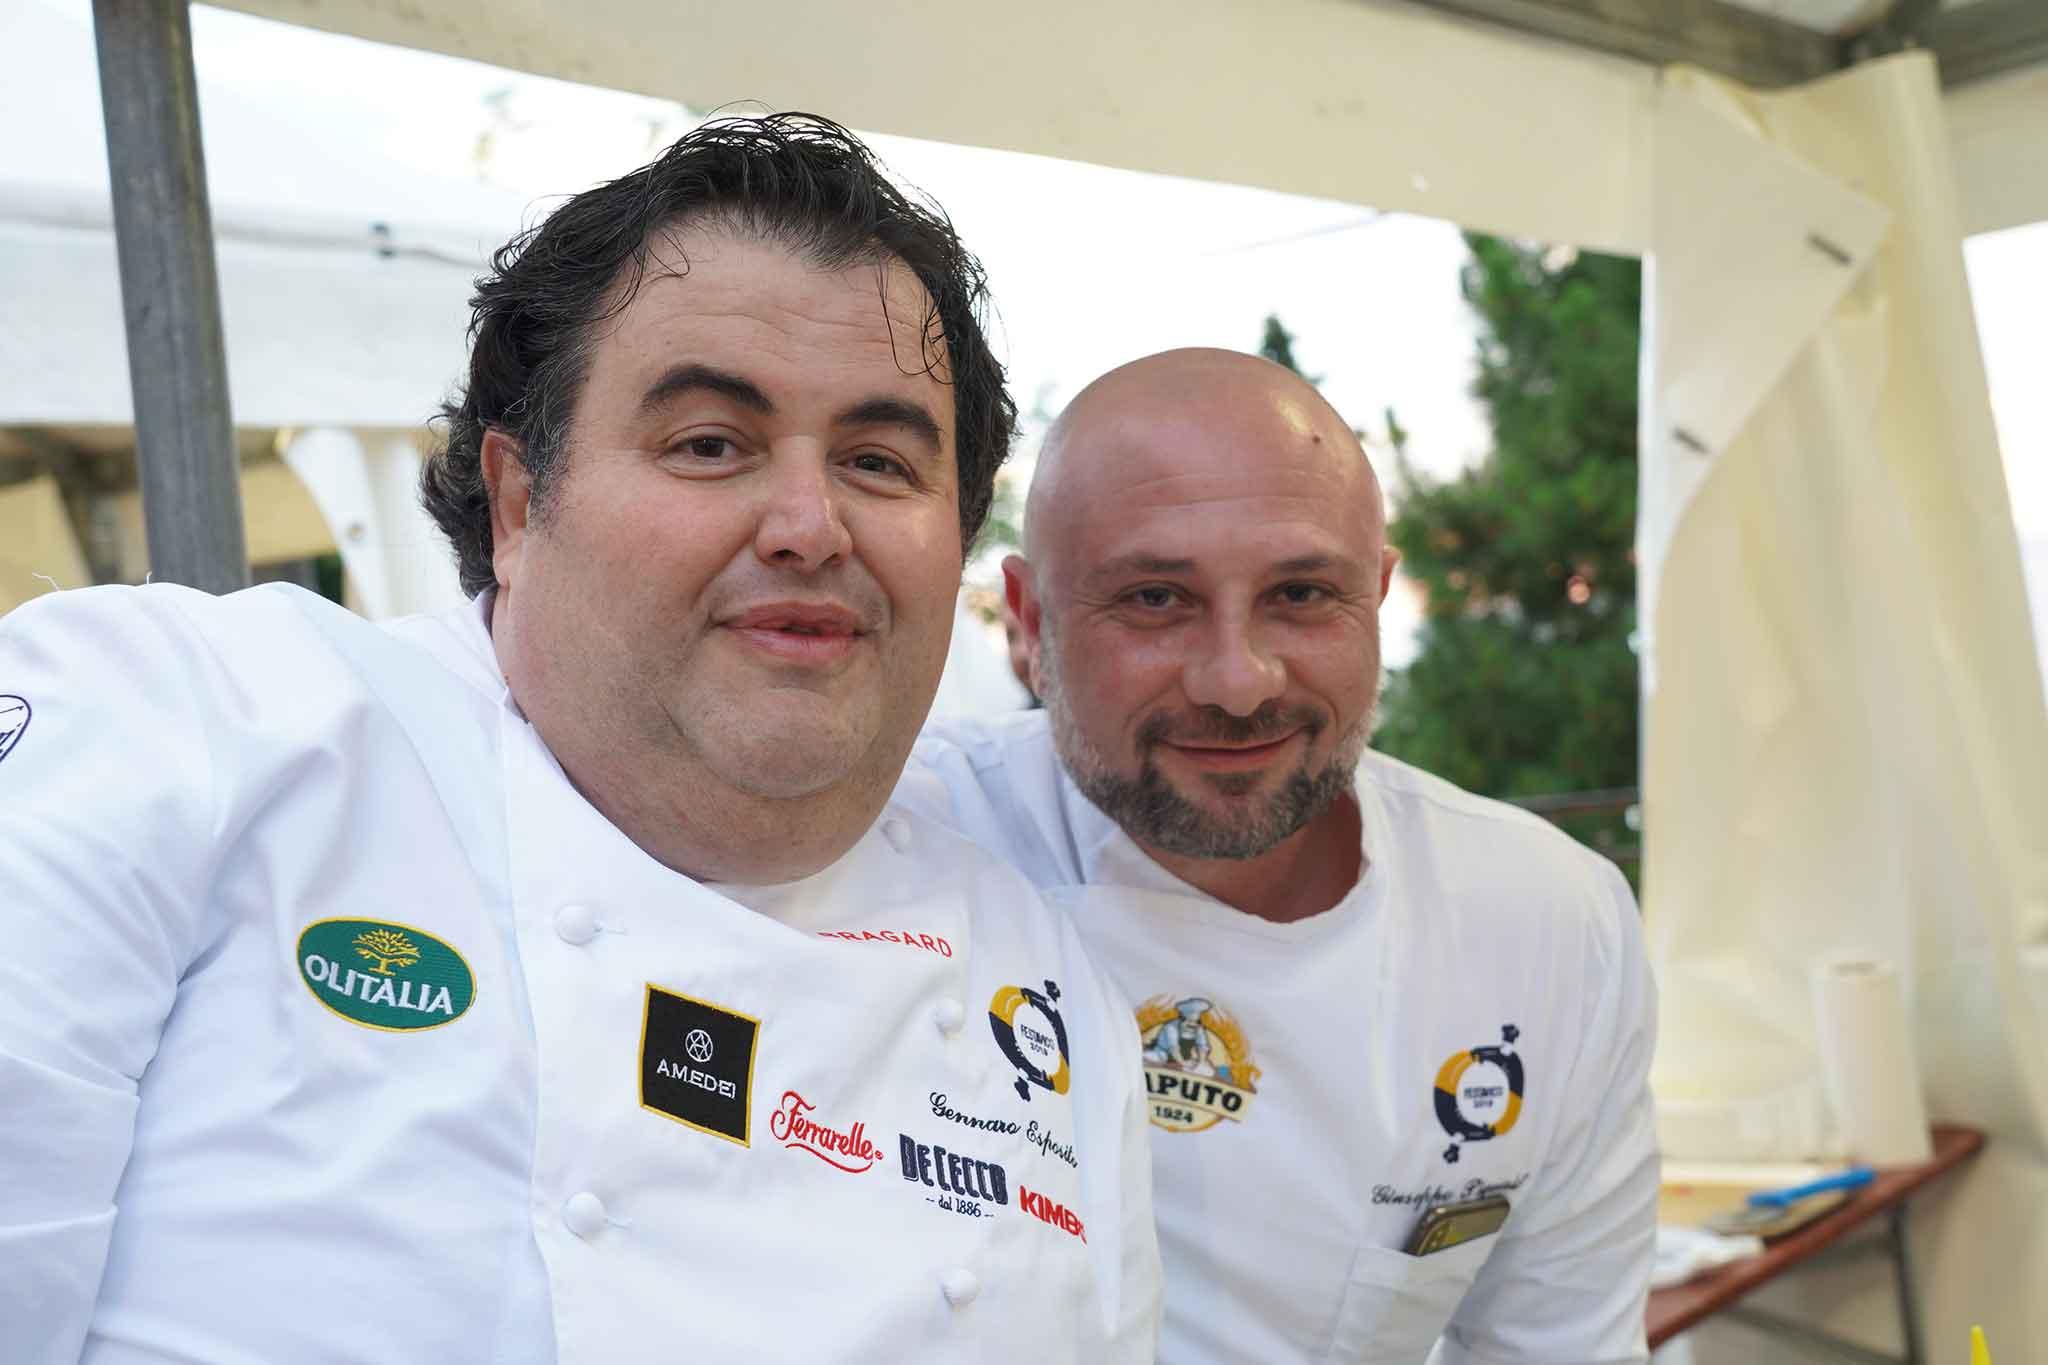 Gennaro Esposito e Giuseppe Pignalosa